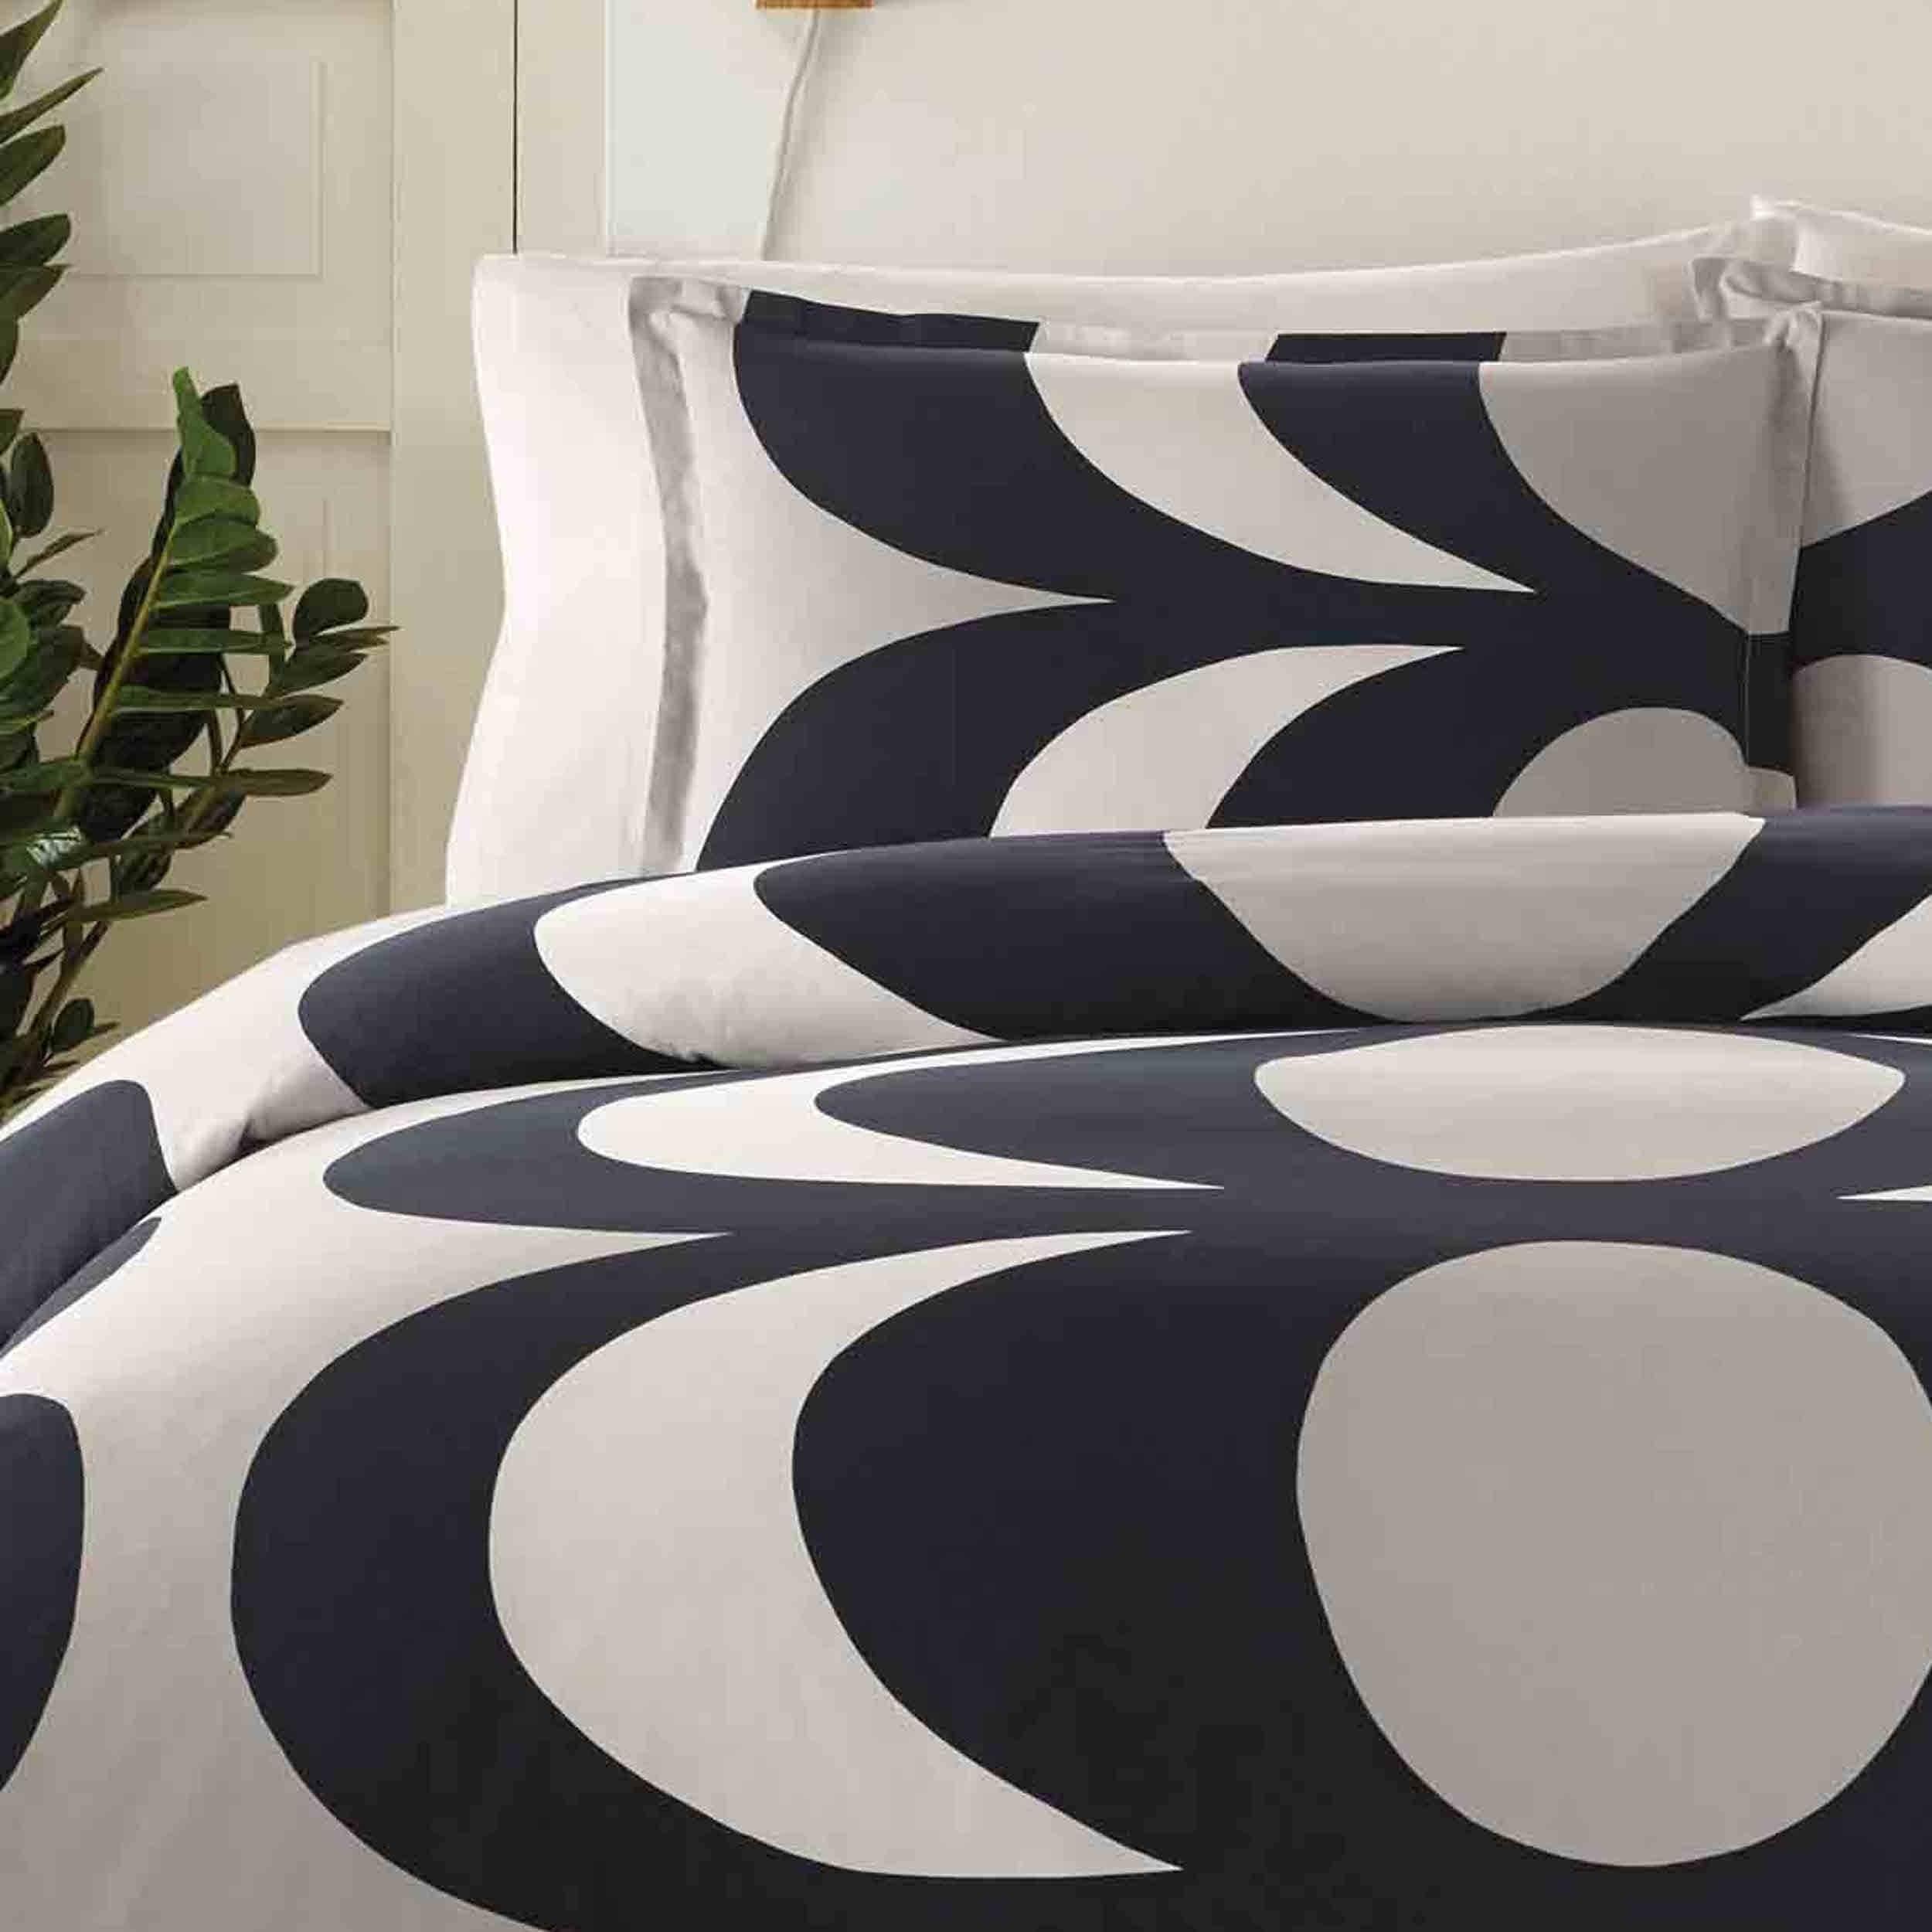 jurmo duvet bath bed pdp bedding set marimekko cover ca wayfair reviews